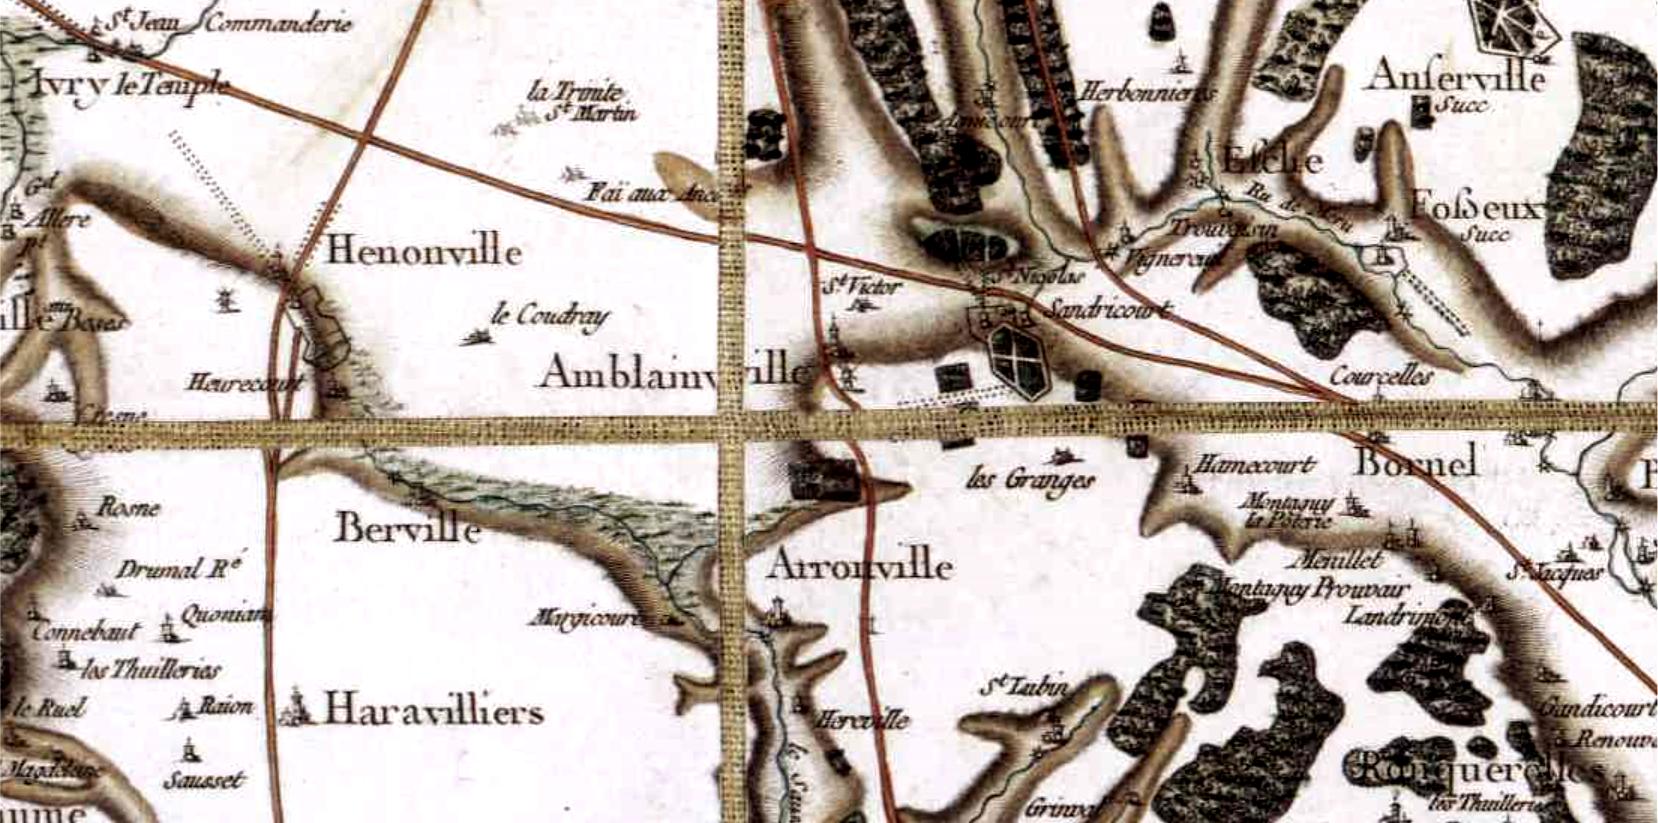 Amblainville 60 cassini